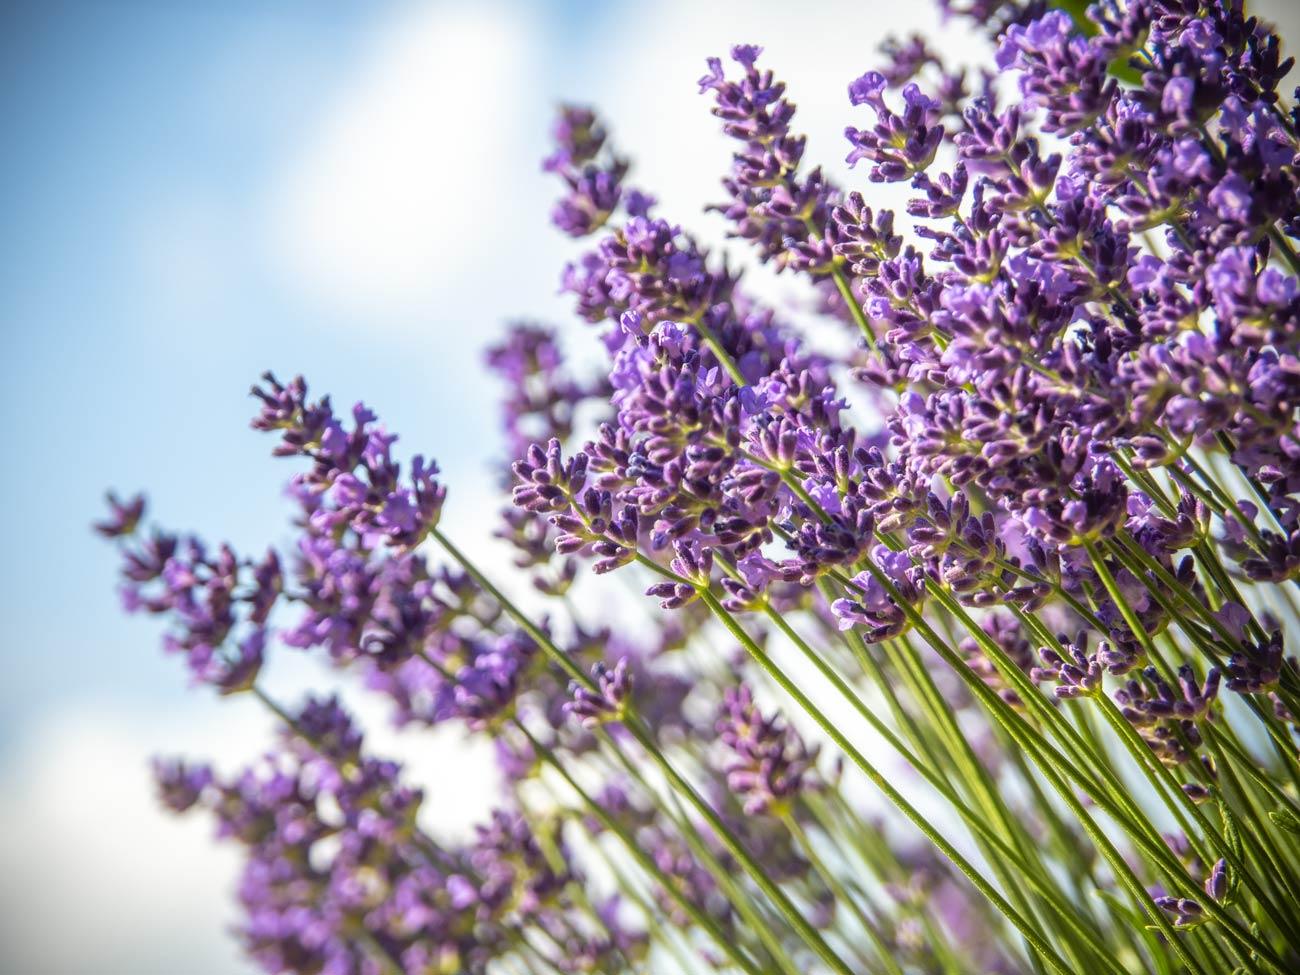 Jetzt blüht der Lavendel